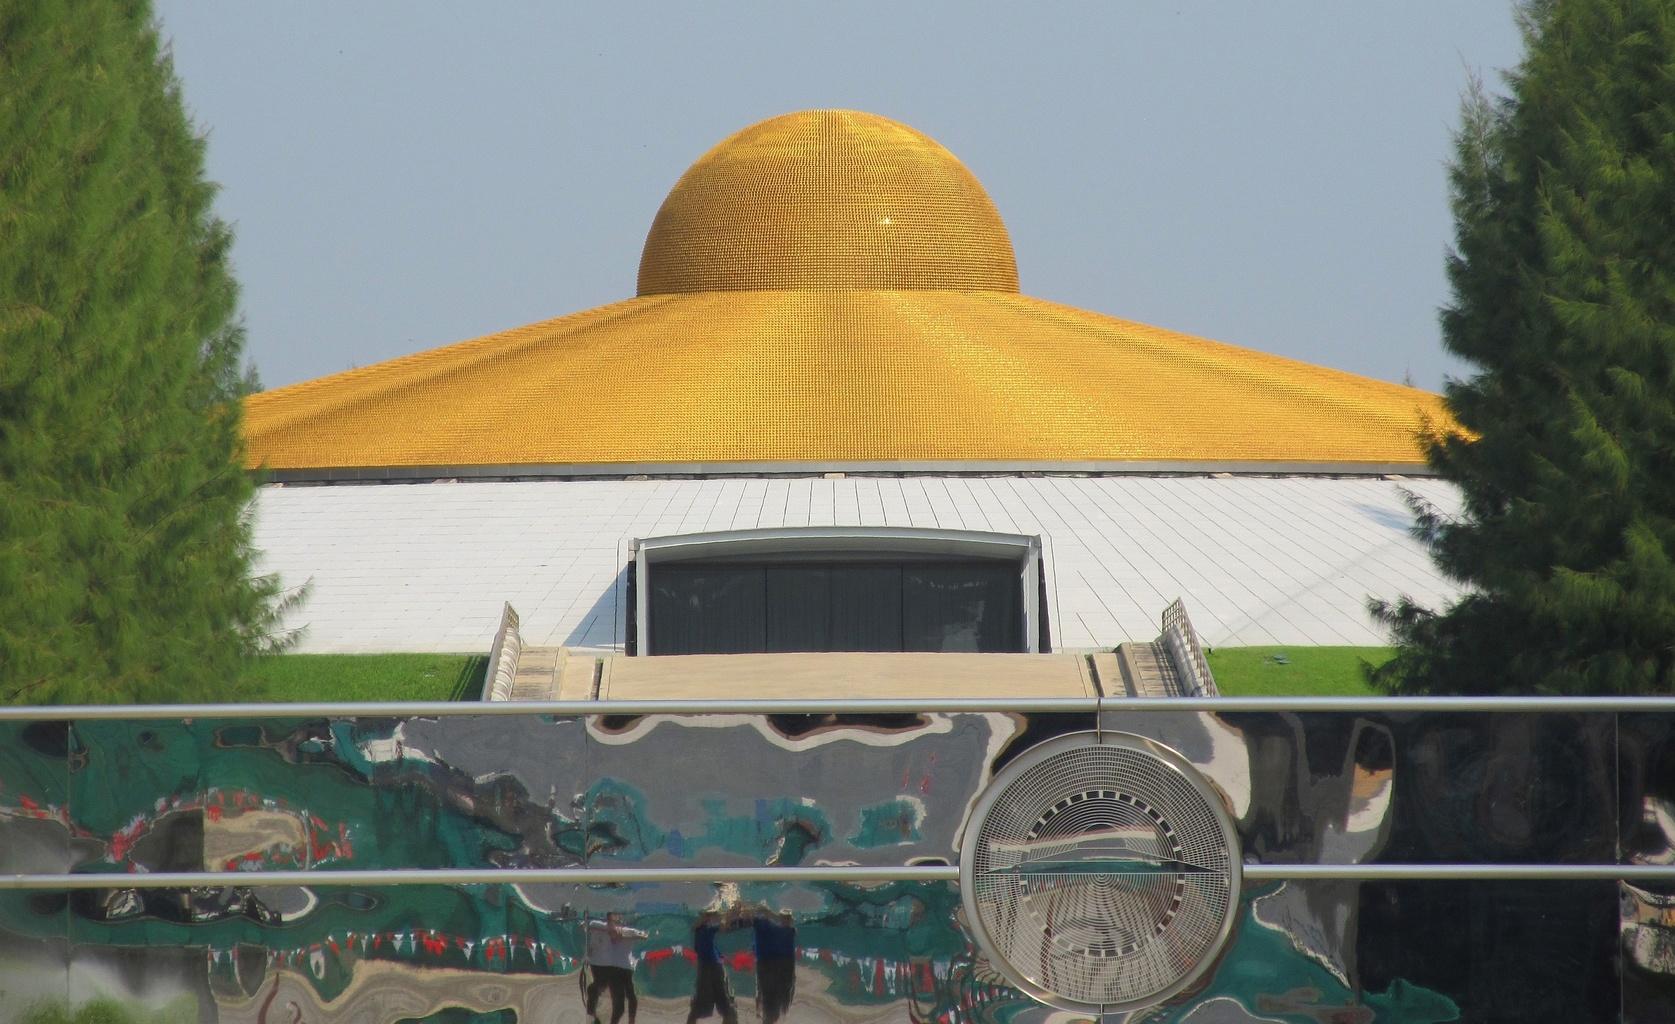 Budova 60 - nerezová brána se znakem UFO - Wat Phra Dhammakaya - Thajsko